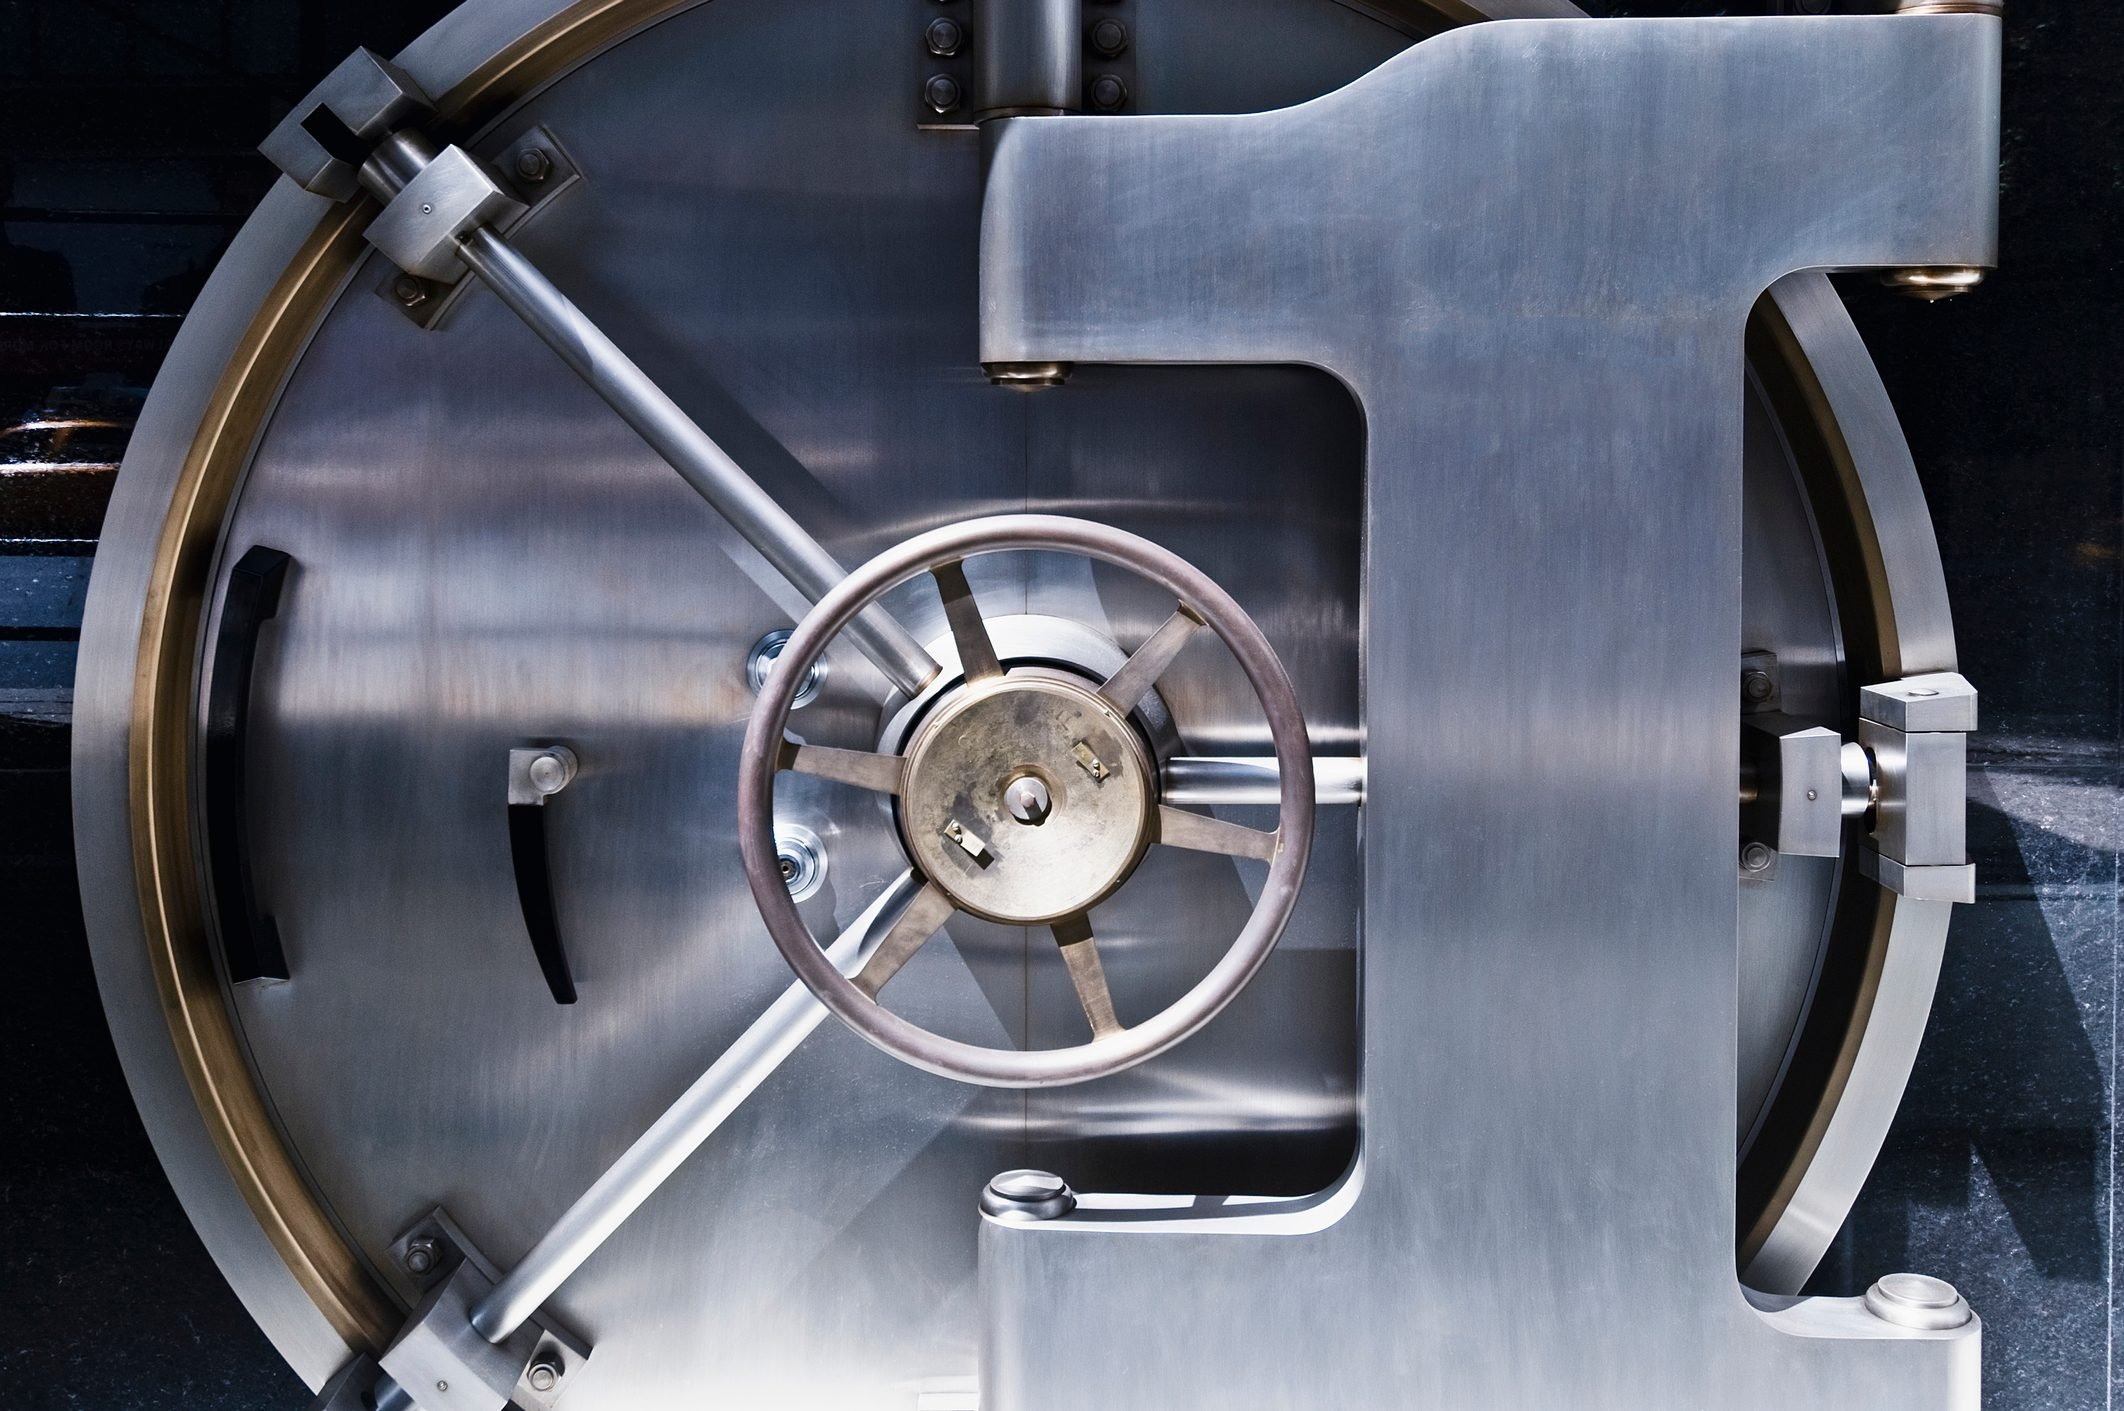 Close up of safe